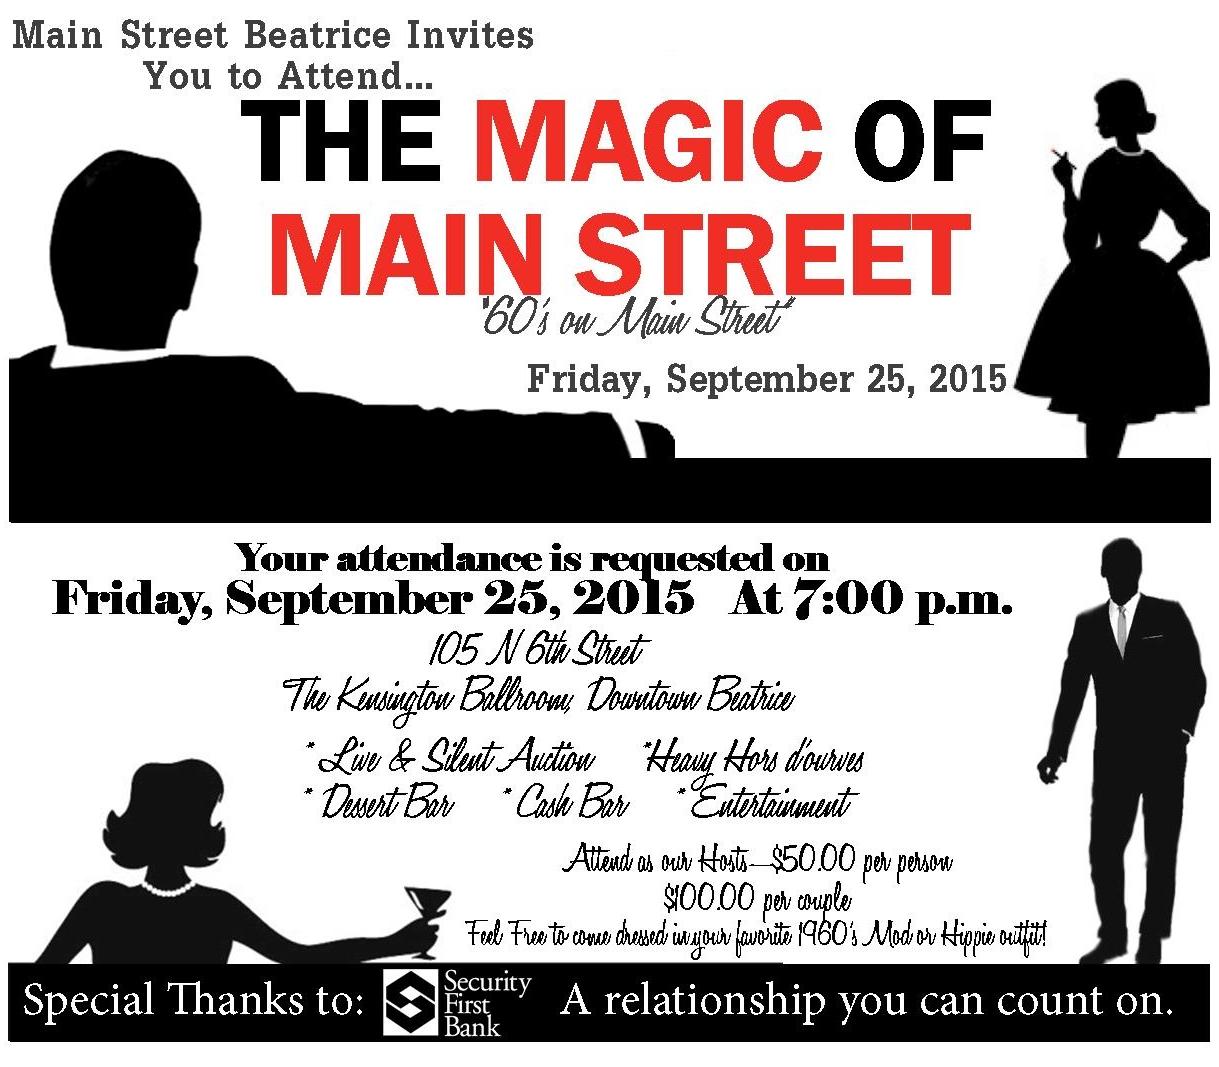 2015 Magic of Main Street Downtown Beatrice, NE